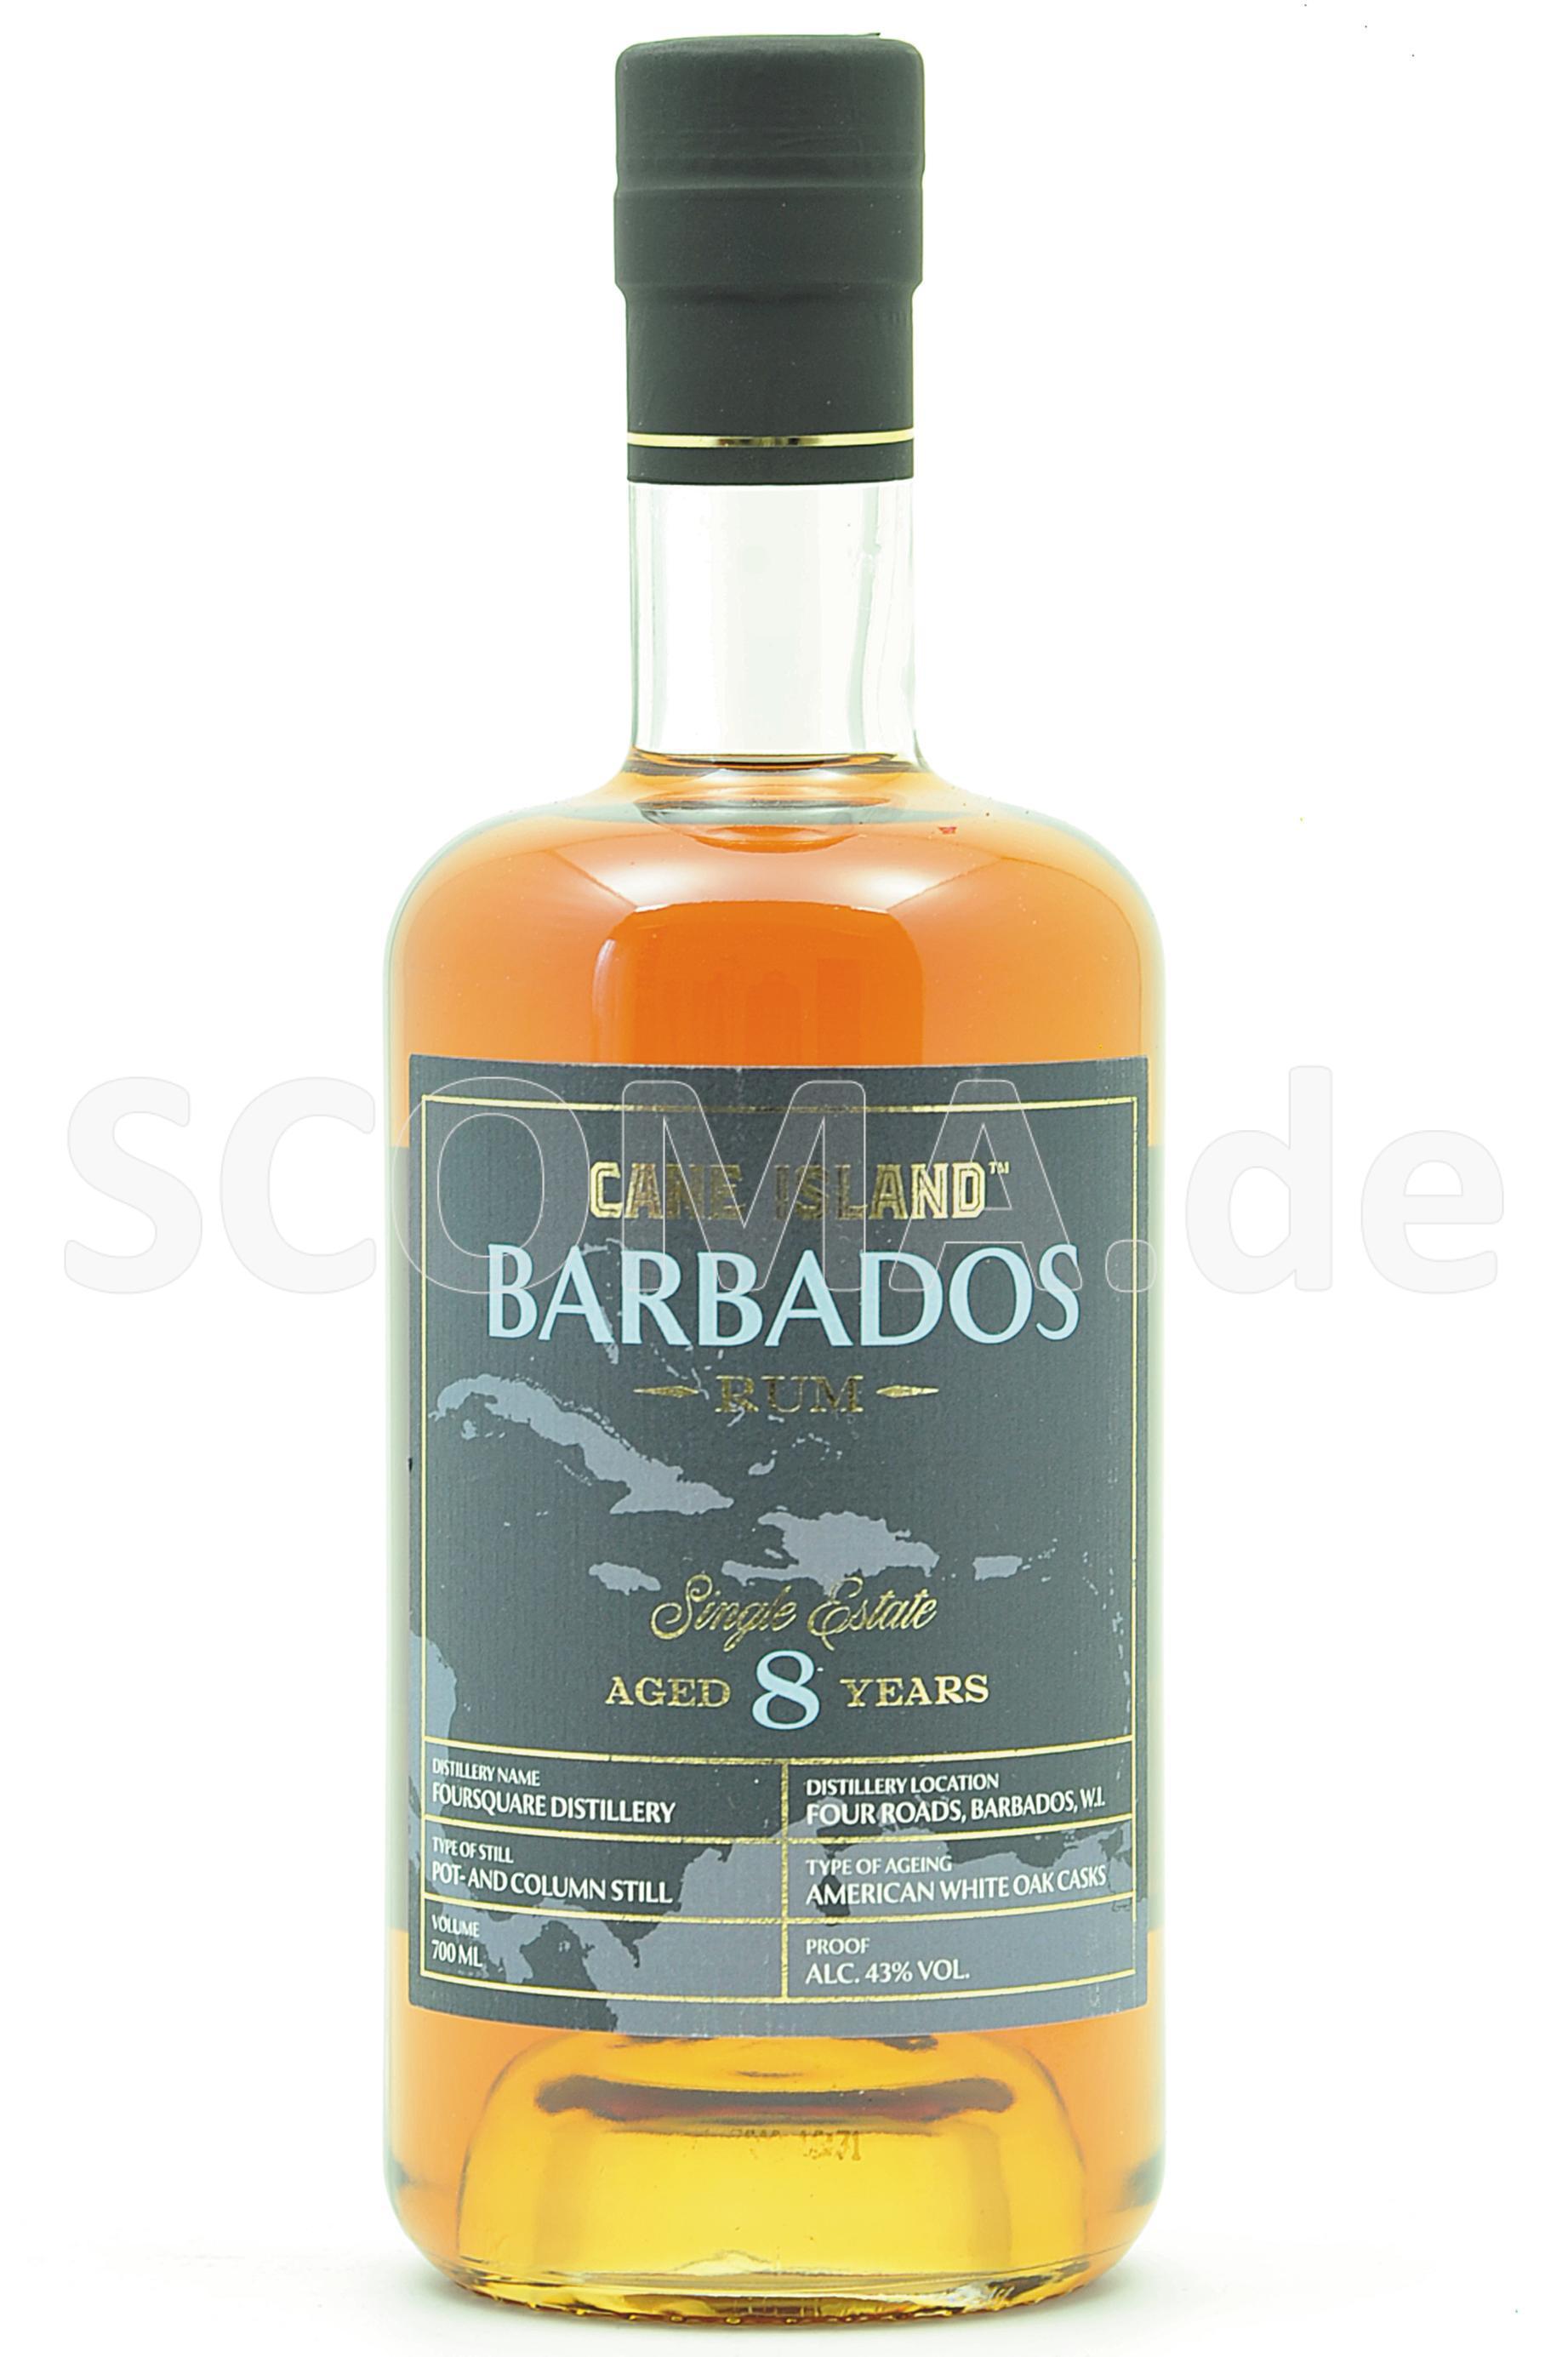 Cane Island Barbados Rum 8 Jah...